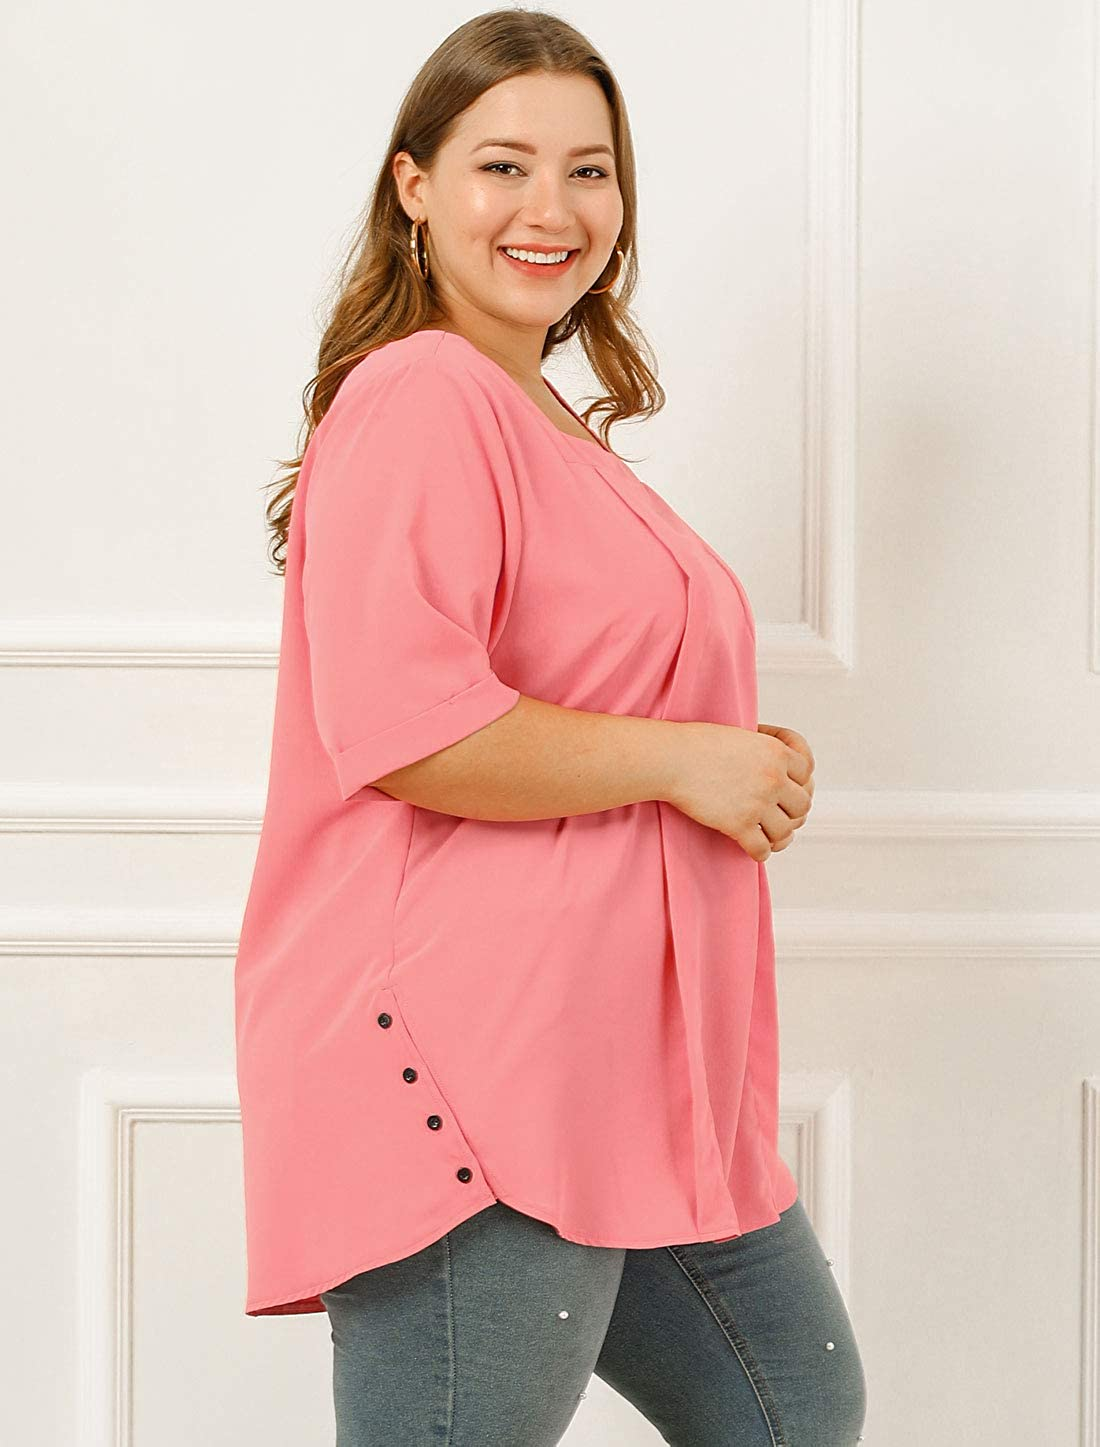 Agnes Orinda Womens Plus Size Chiffon Blouse Square Neck Half Sleeve Pleated Casual Top